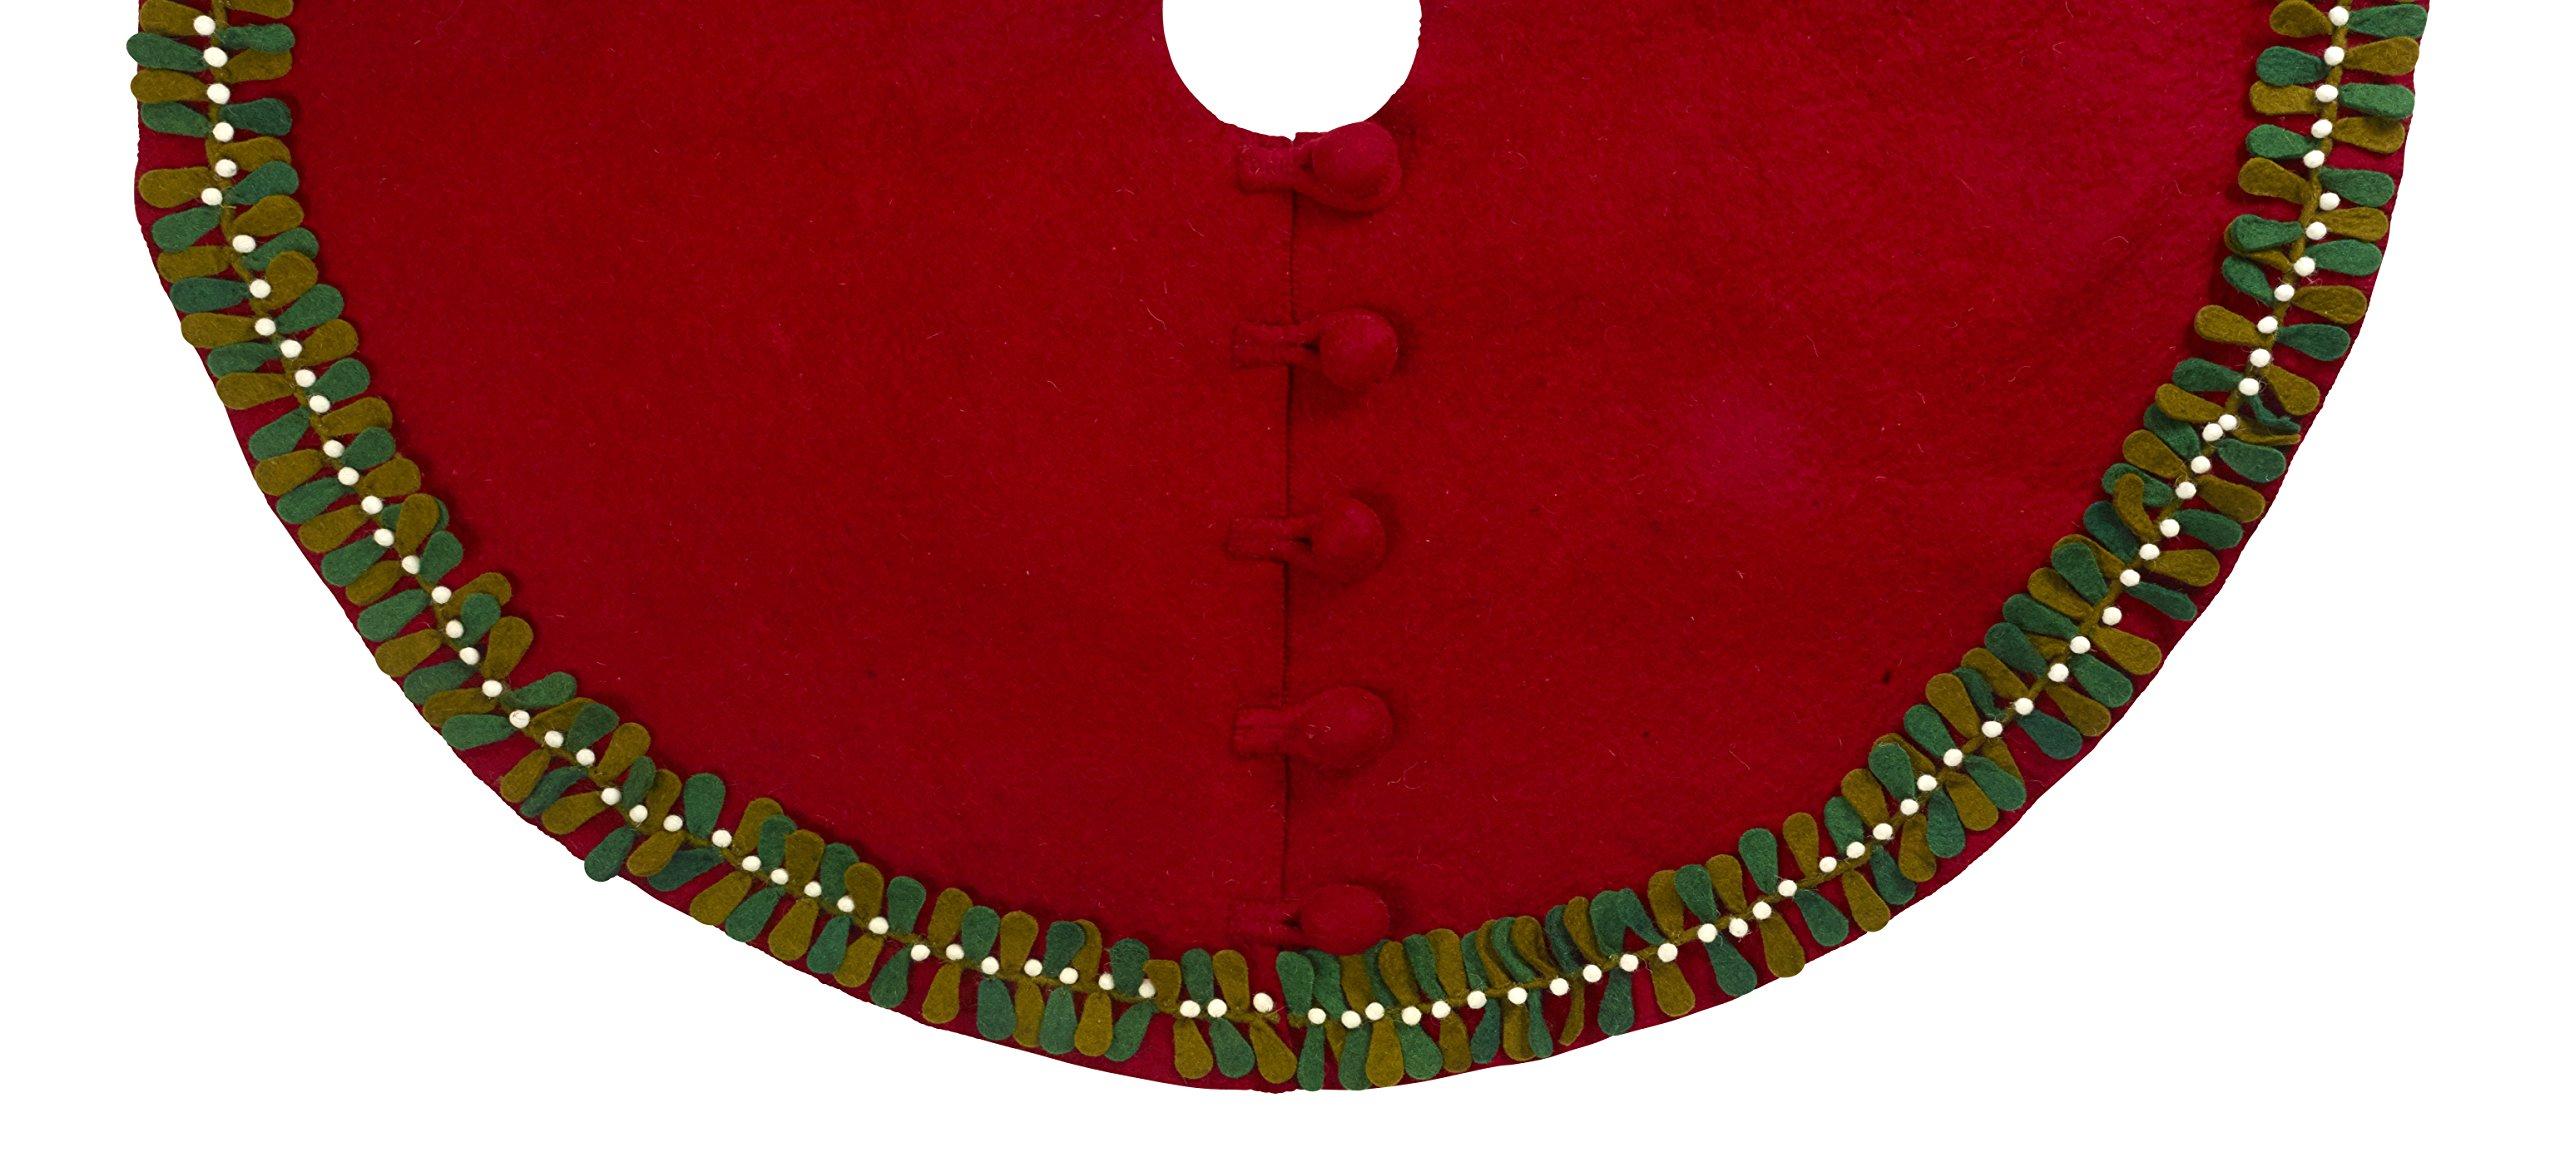 Arcadia Home Mistletoe Tree Skirt in Hand Felted Wool